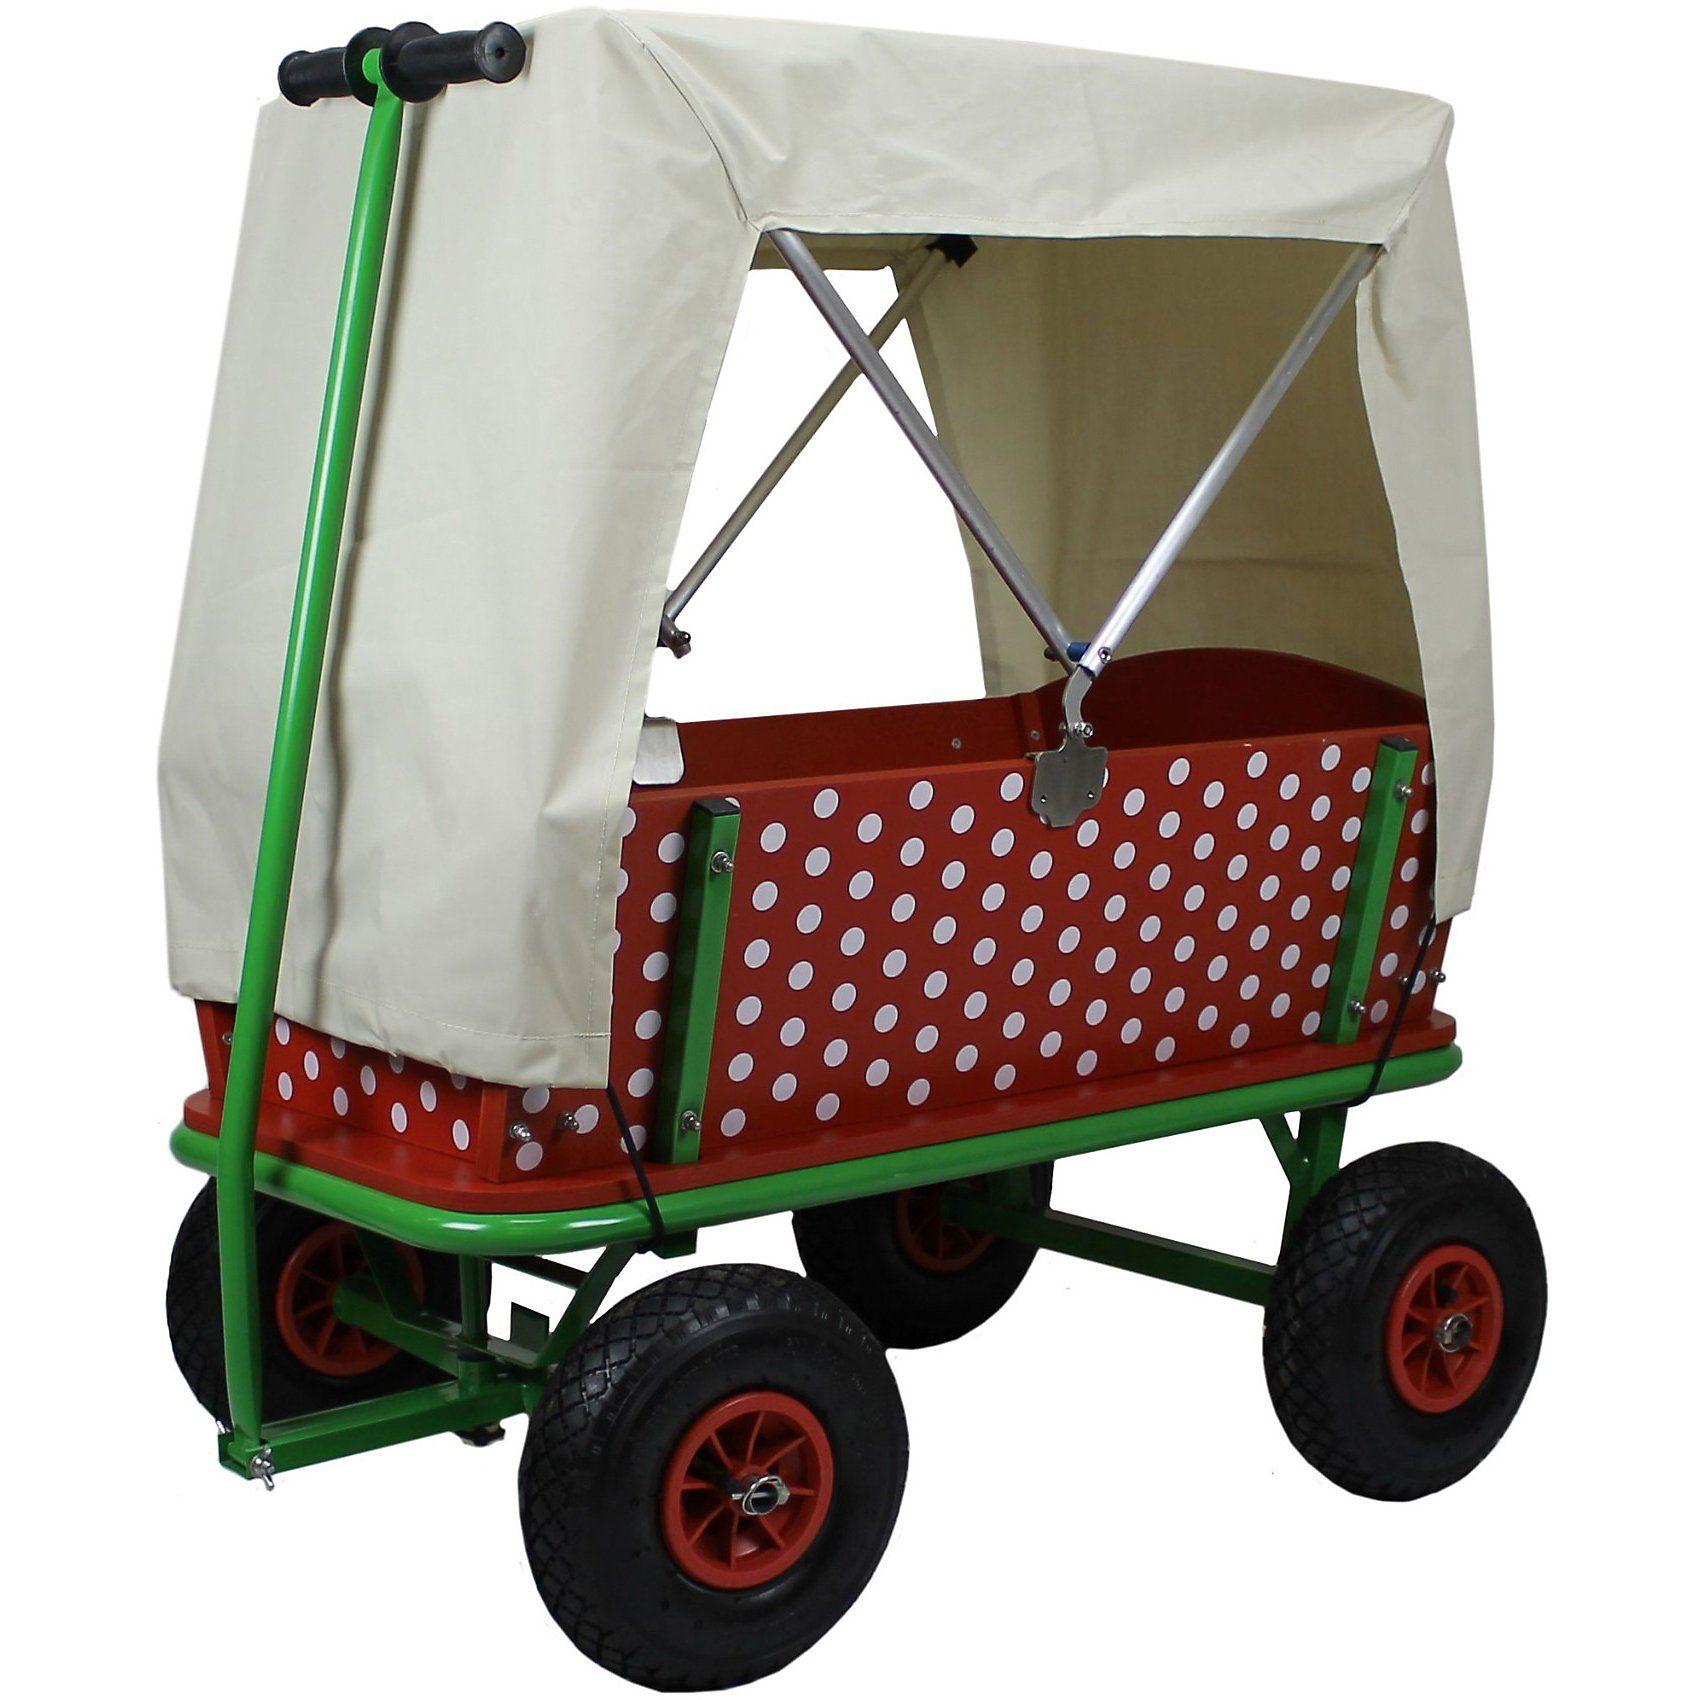 Beachtrekker Bollerwagen Style Rotkäppchen mit Faltdeck